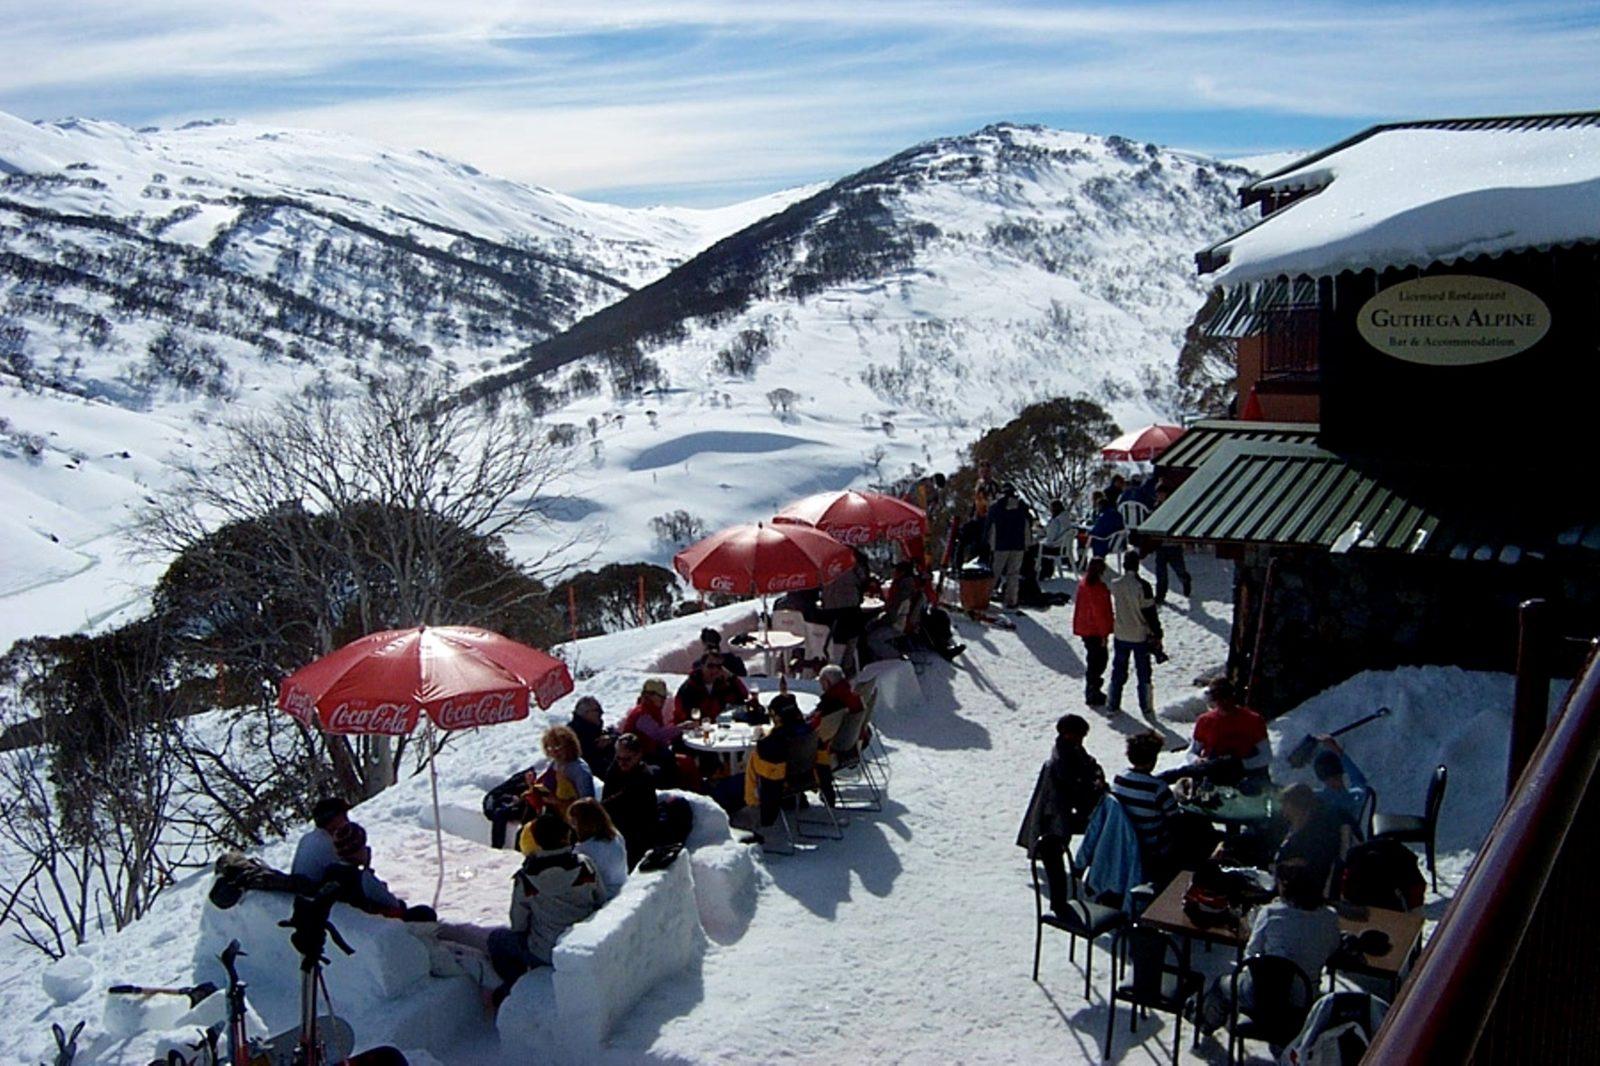 View from Guthega Alpine Hotel